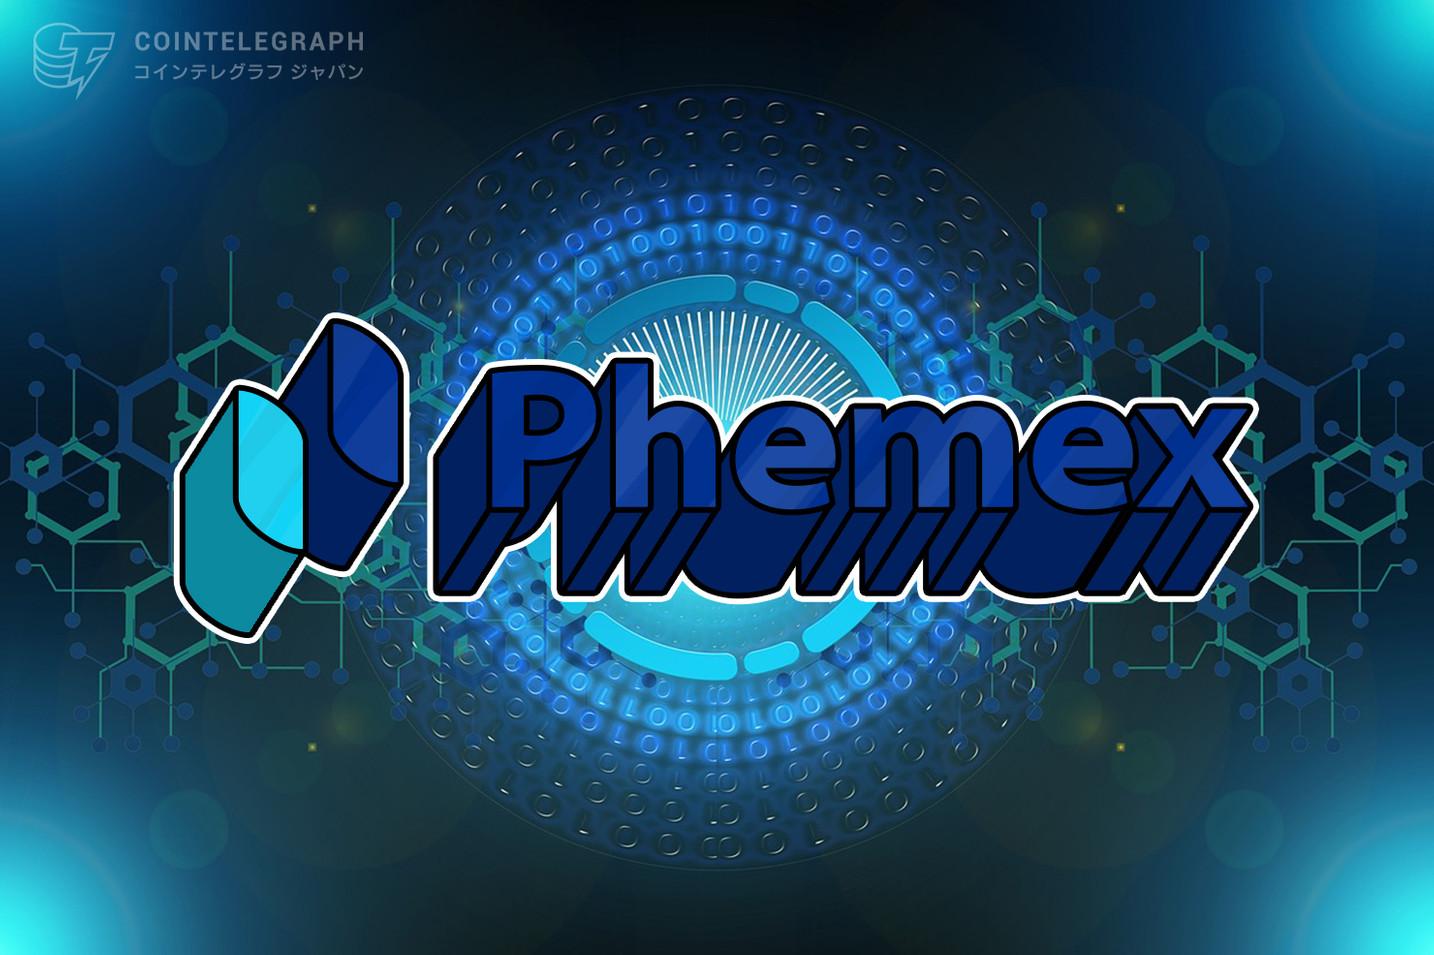 Phemex|急成長中の革新的な仮想通貨ニューパワー